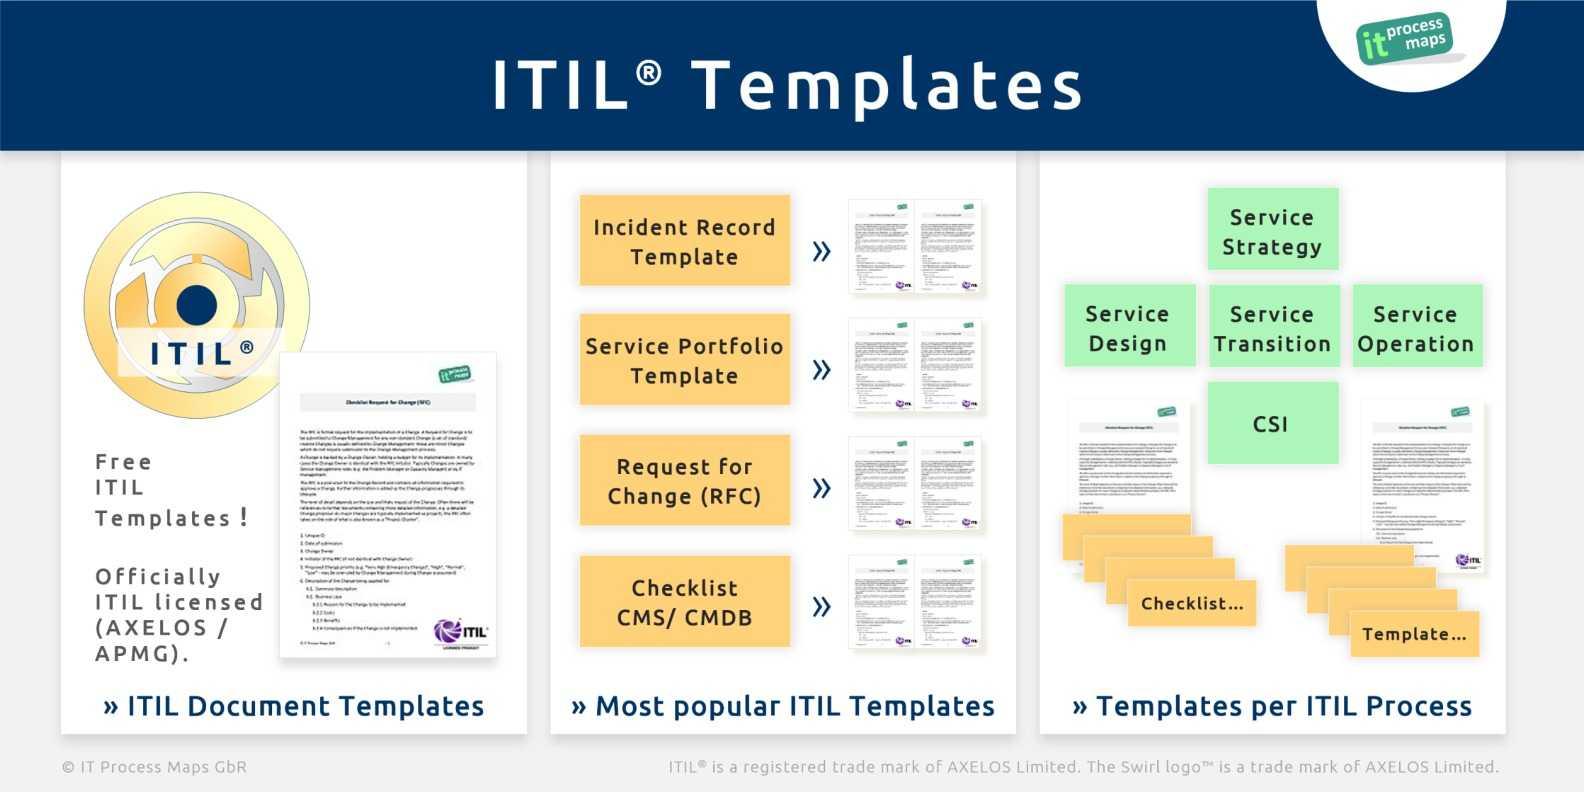 itil checklists it process wiki regarding incident